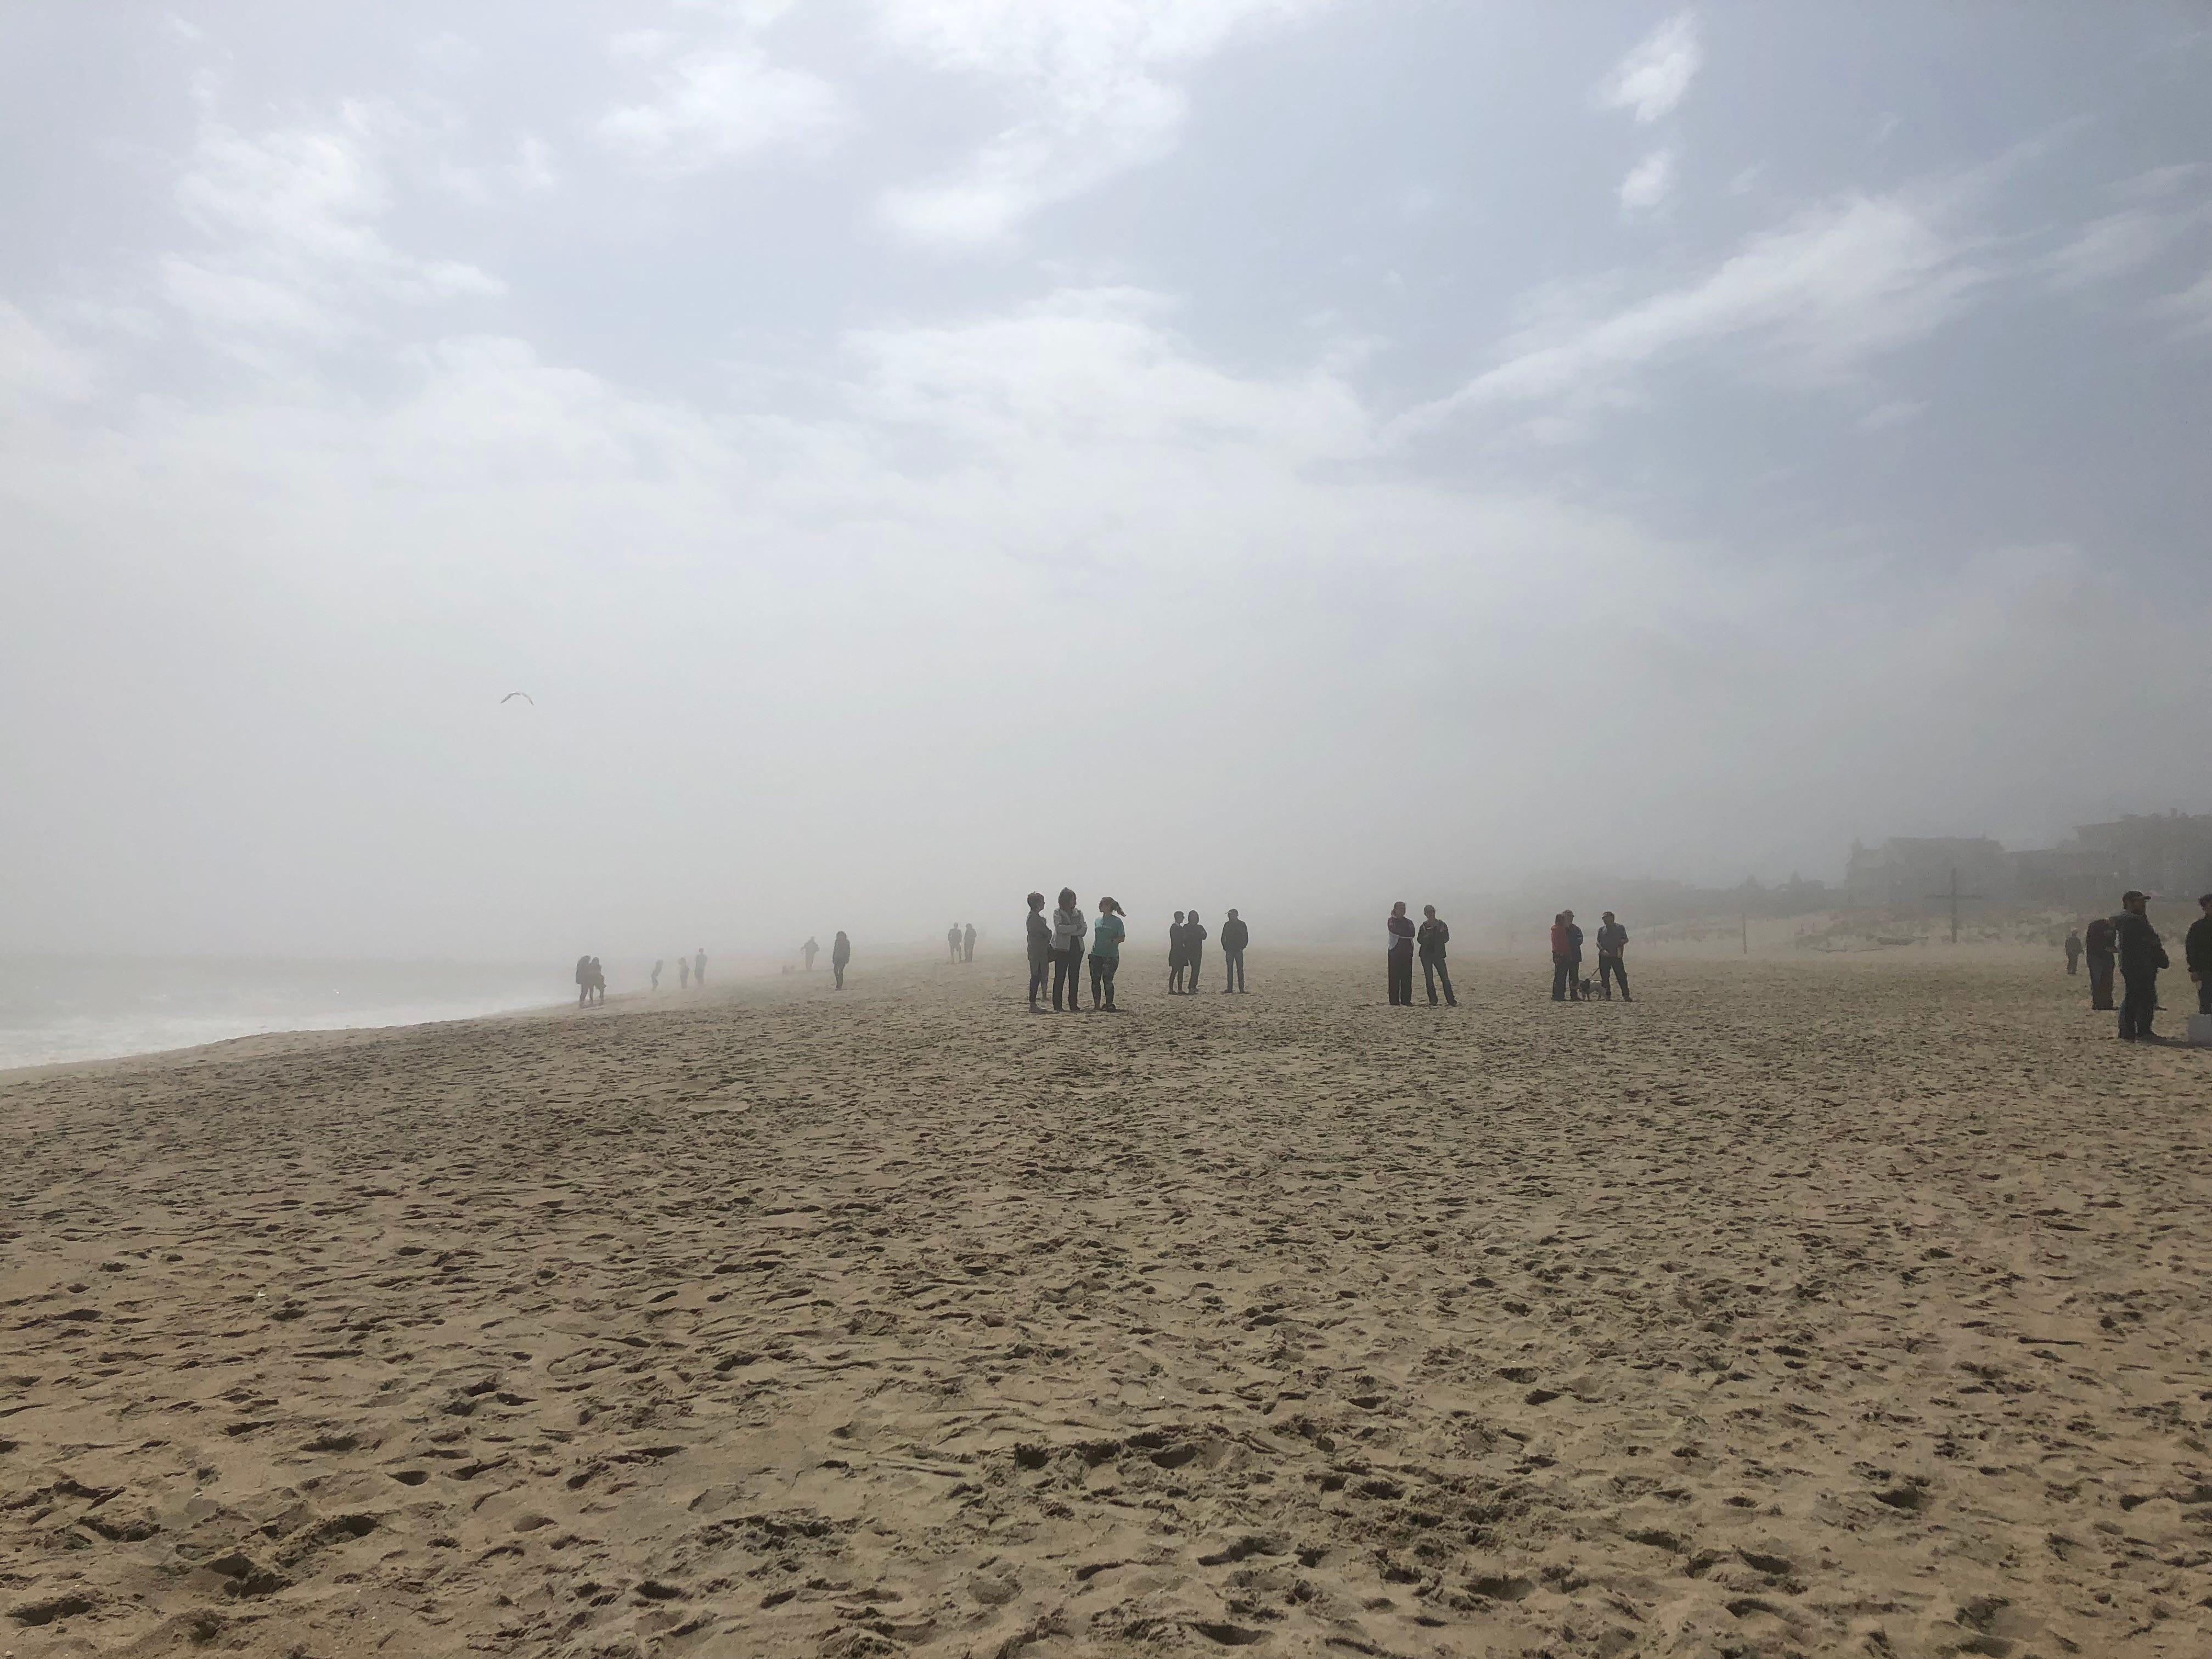 Haze from the fire clouded Ocean Grove's beach Saturday